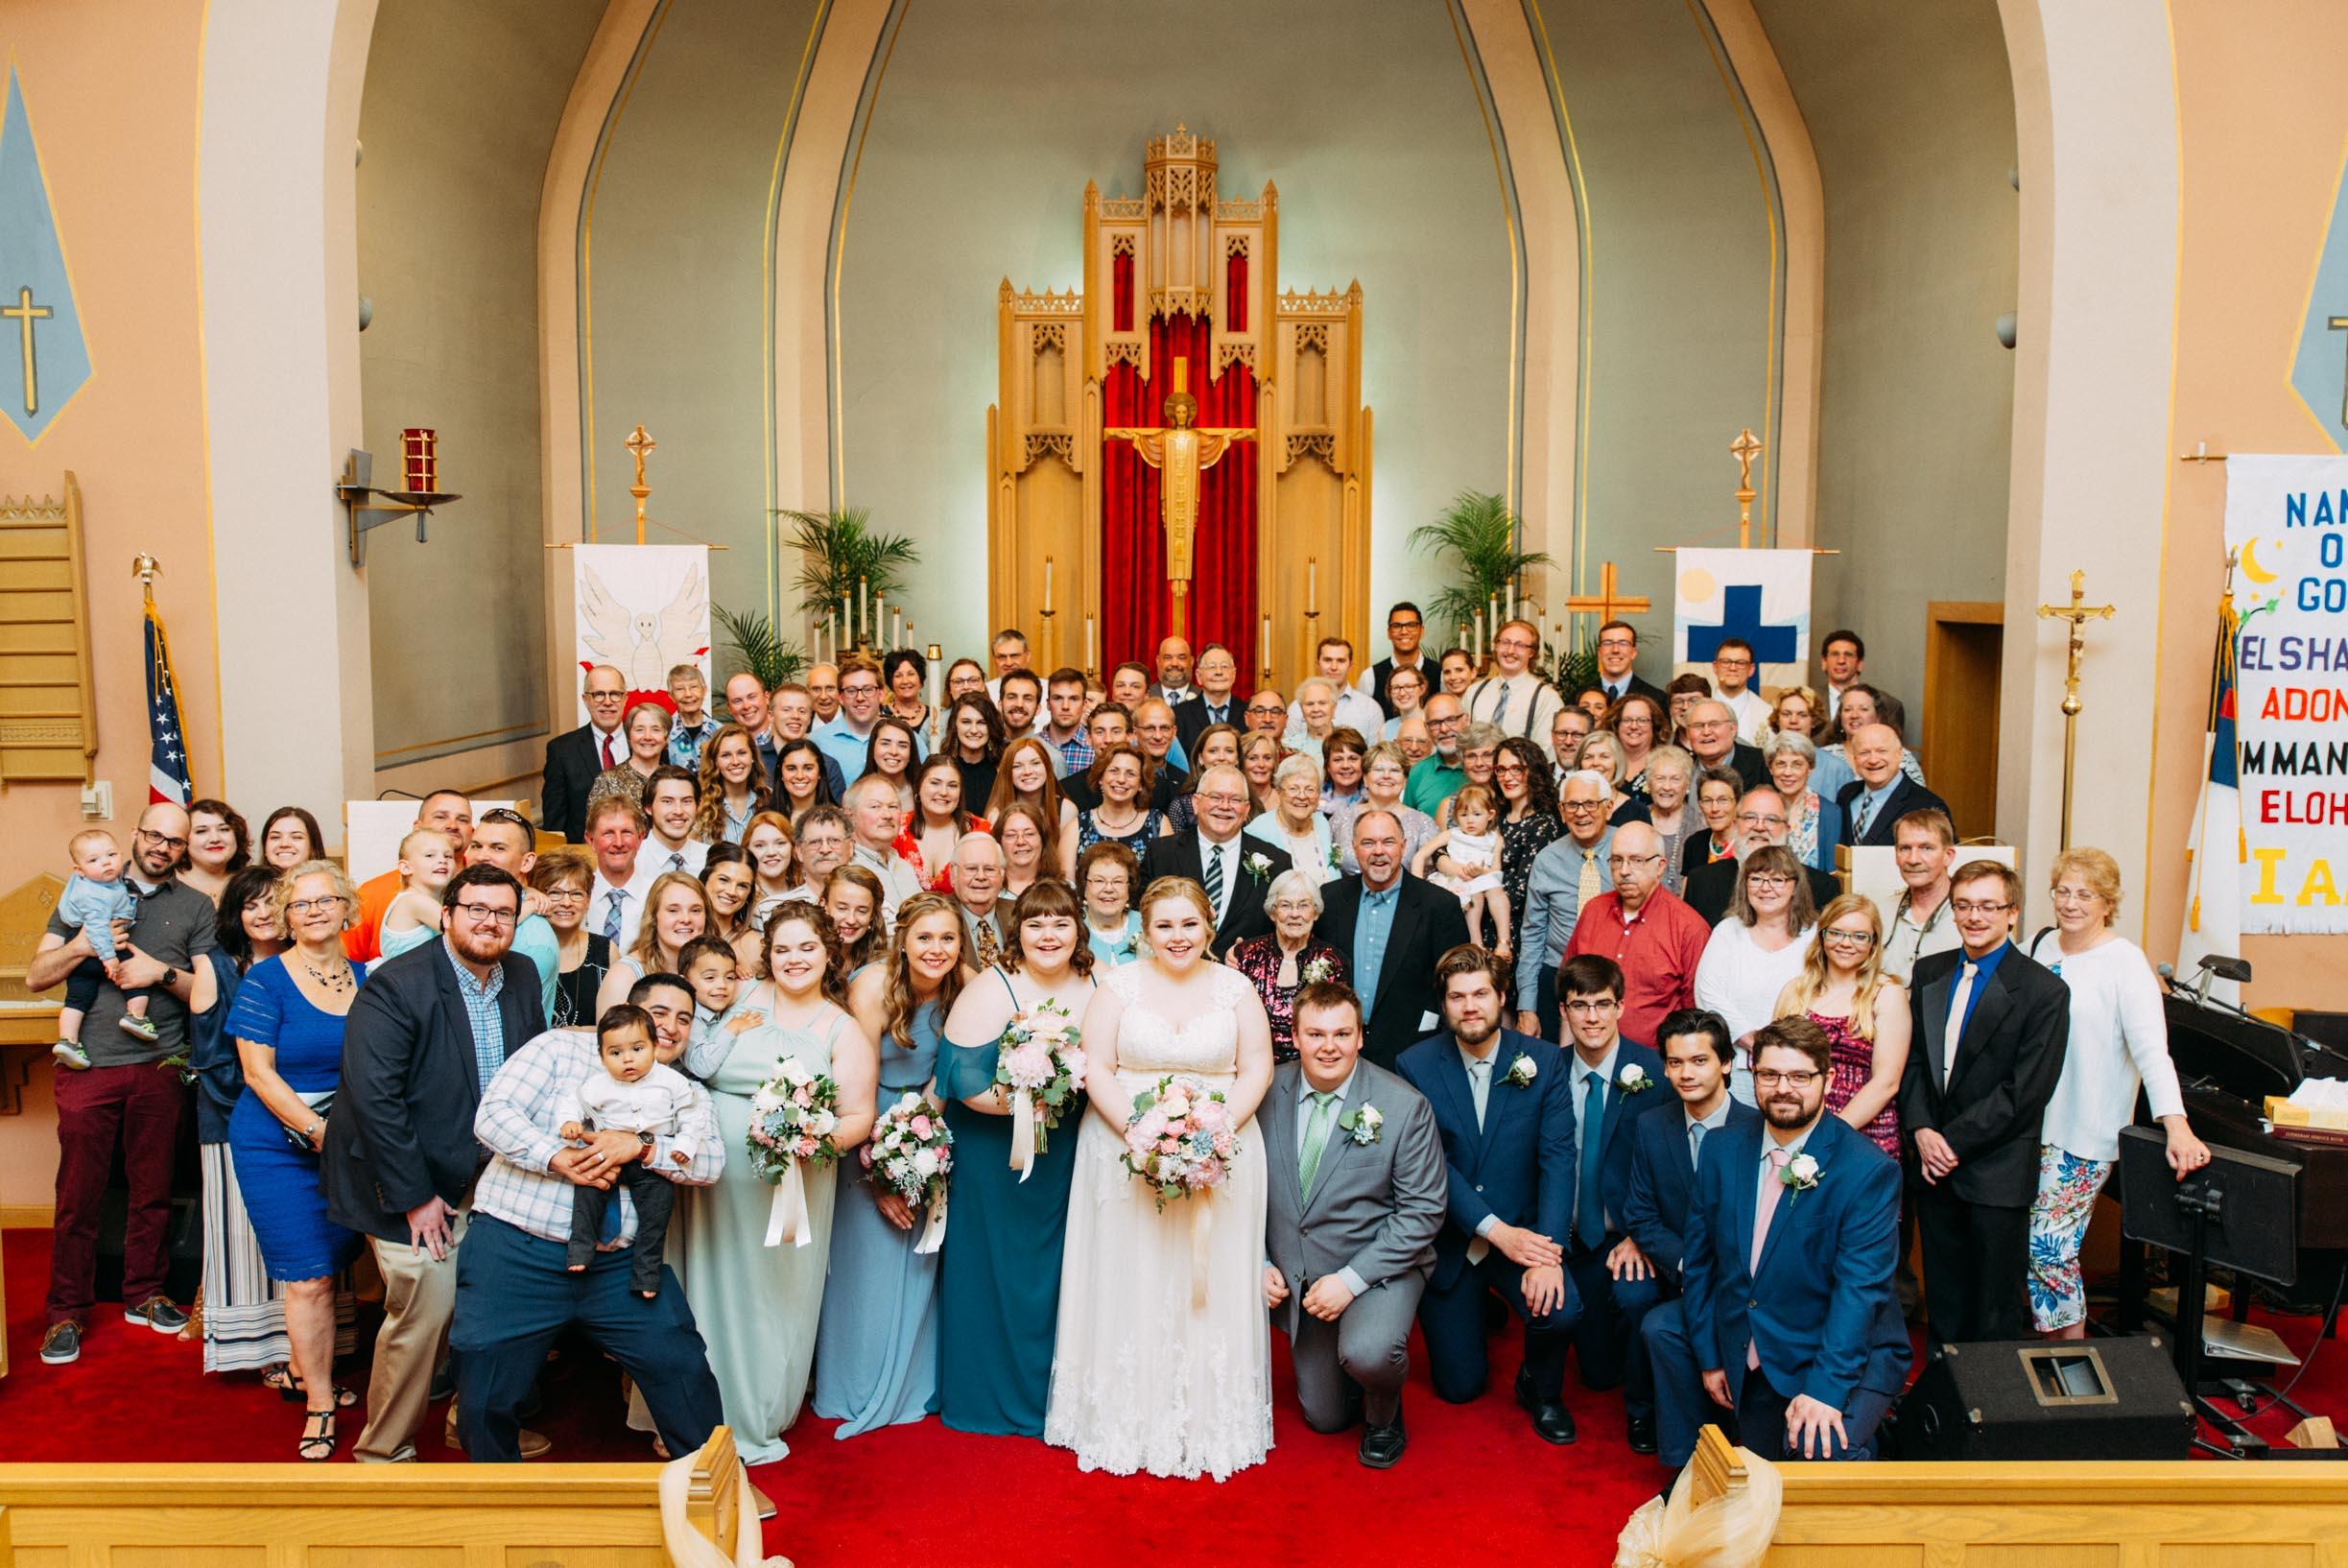 Hannah_Brandon_Wisconsin_Wedding_Ceremony-26.jpg